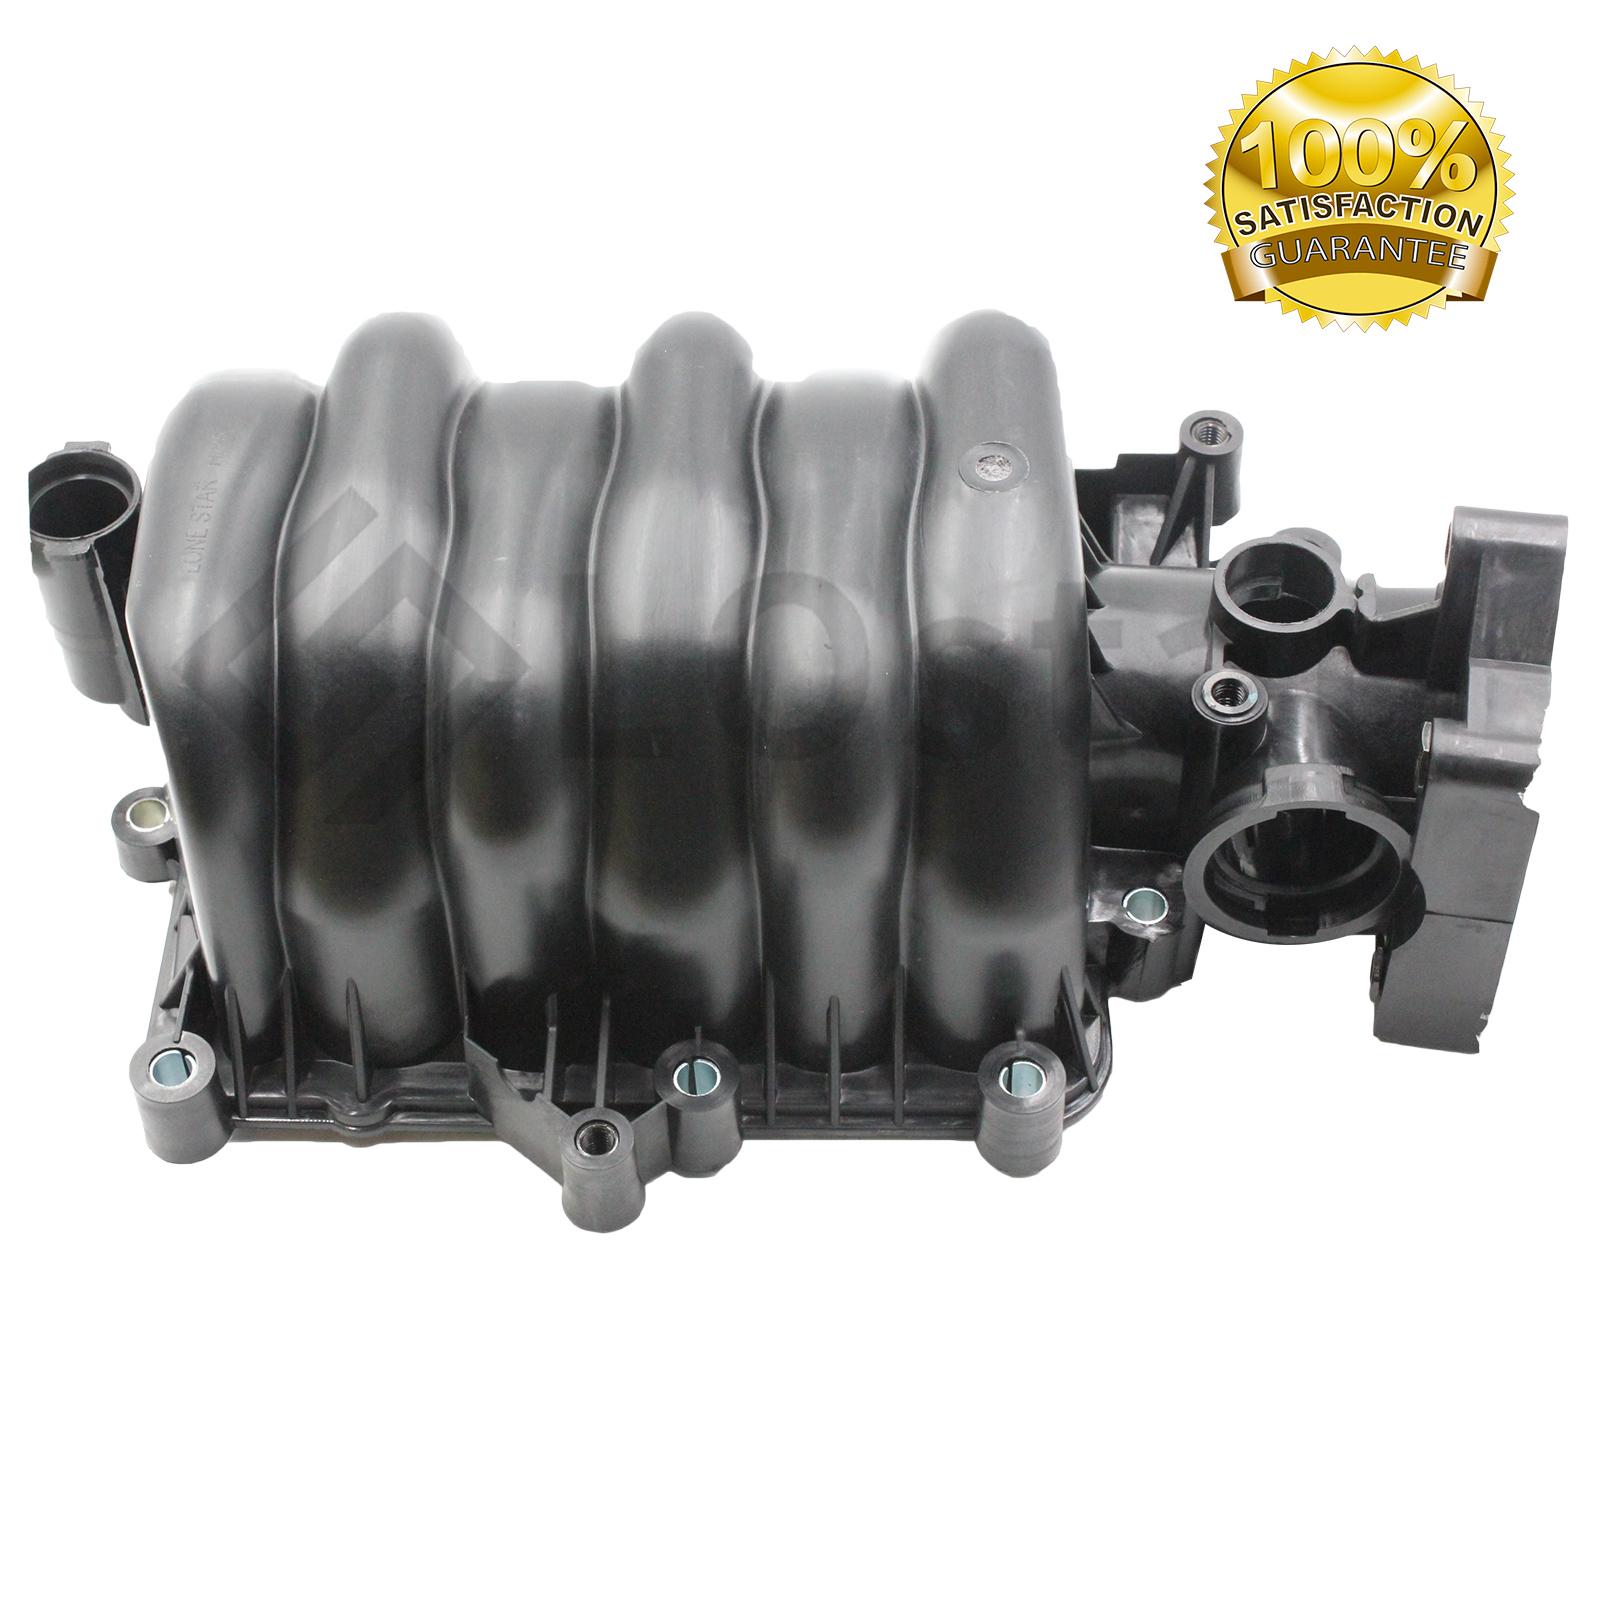 Upper Intake Manifold Fits Buick Chevy Oldsmobile Pontiac